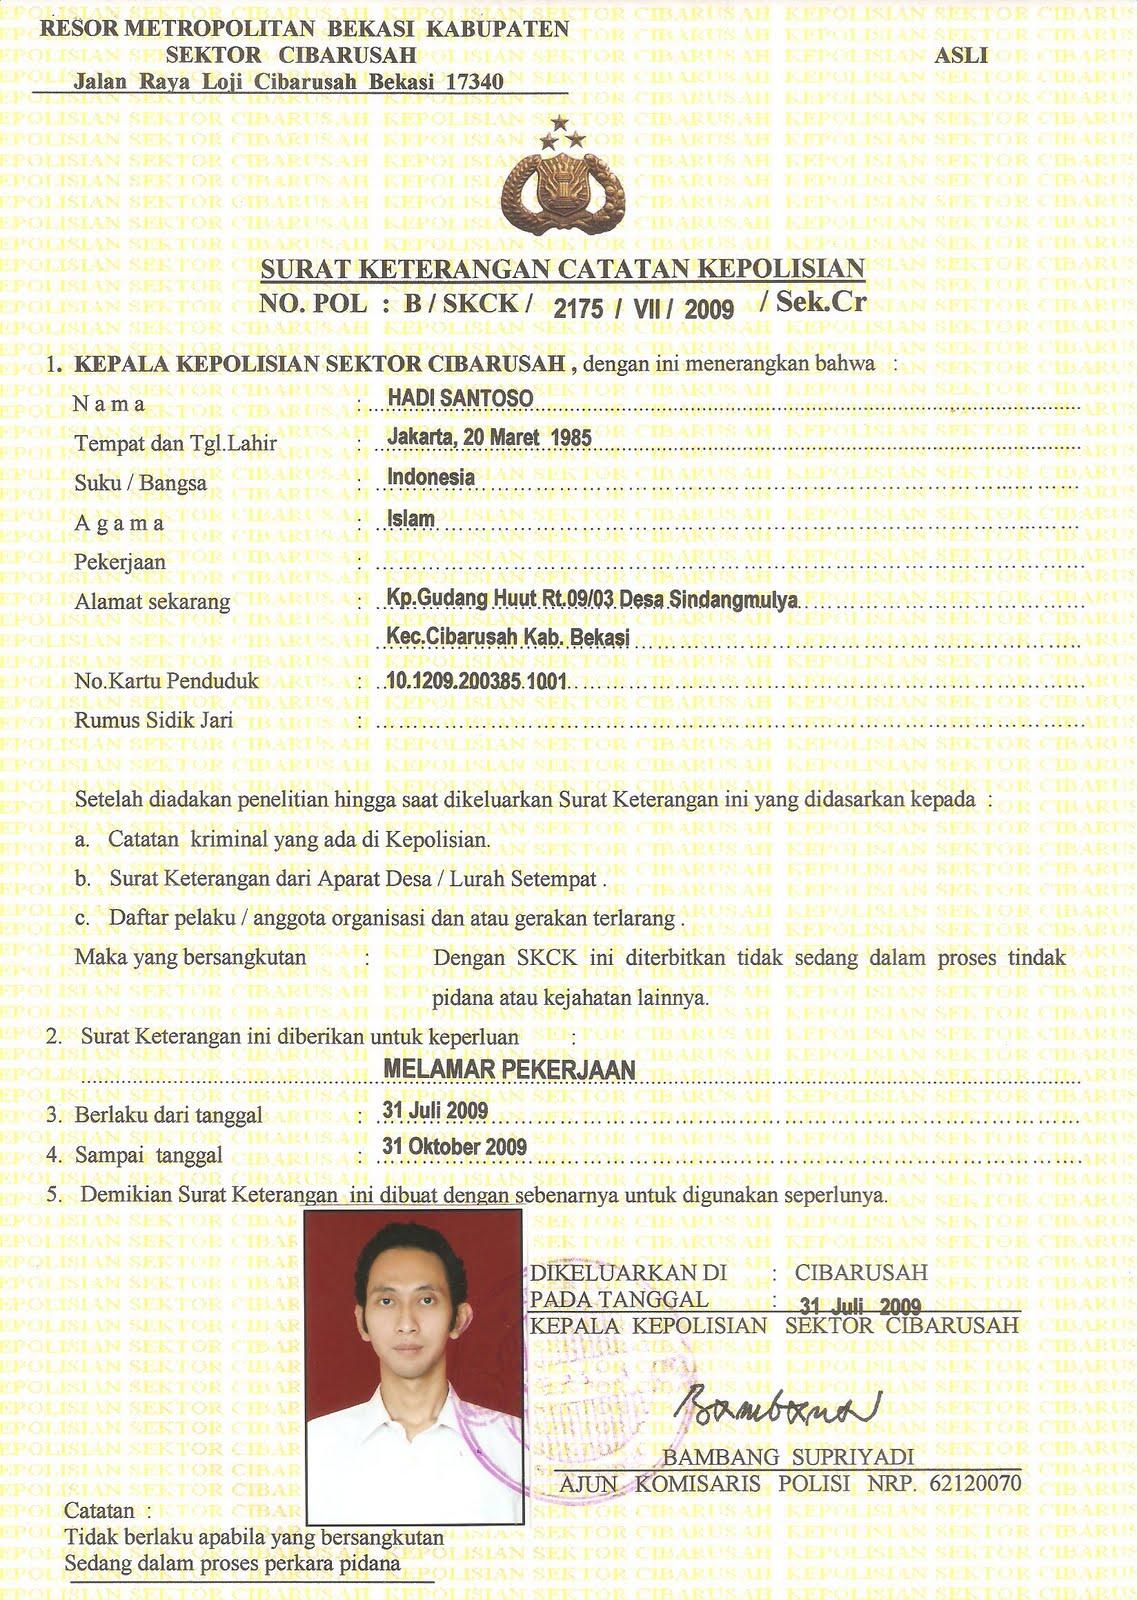 MAKALAH dan ARTIKEL: Februari 2012